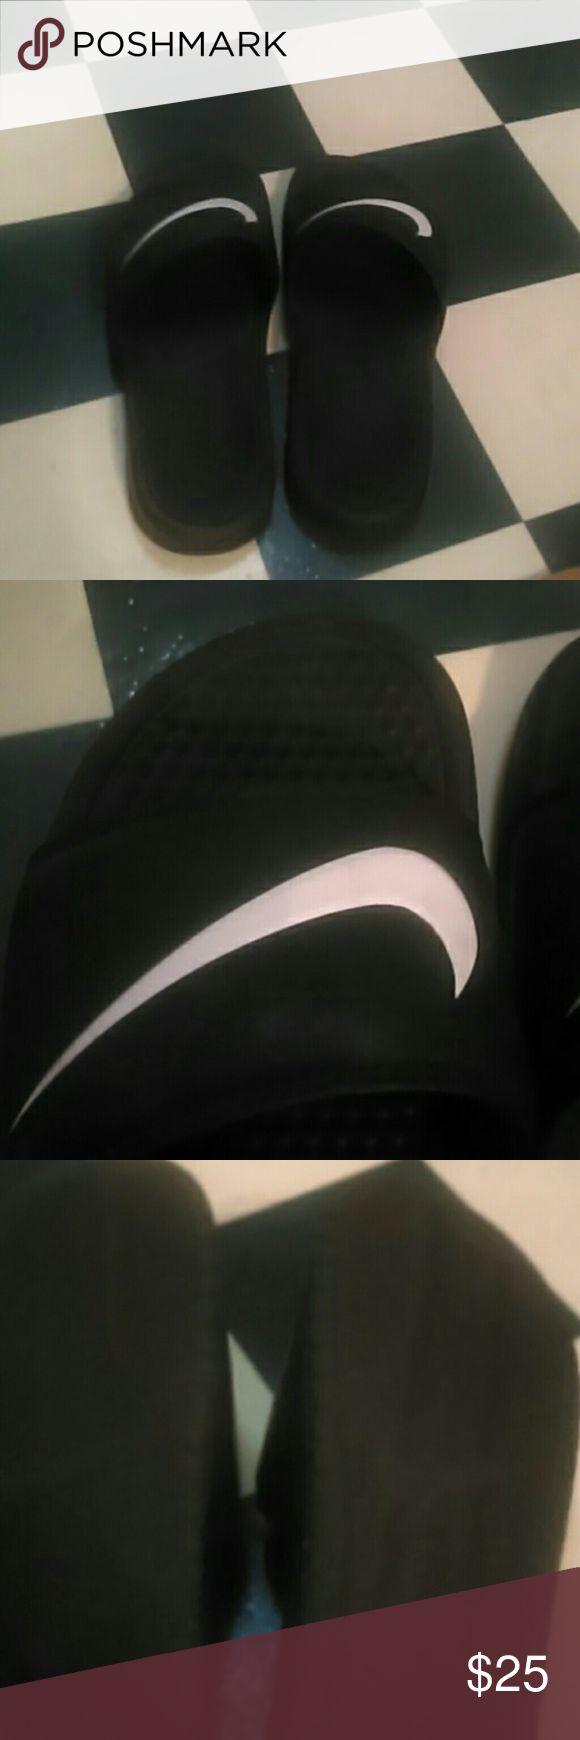 Men's Nike Sandals Men's size 9 Nike black sandals.like new condition.great shape. Shoes Sandals & Flip-Flops